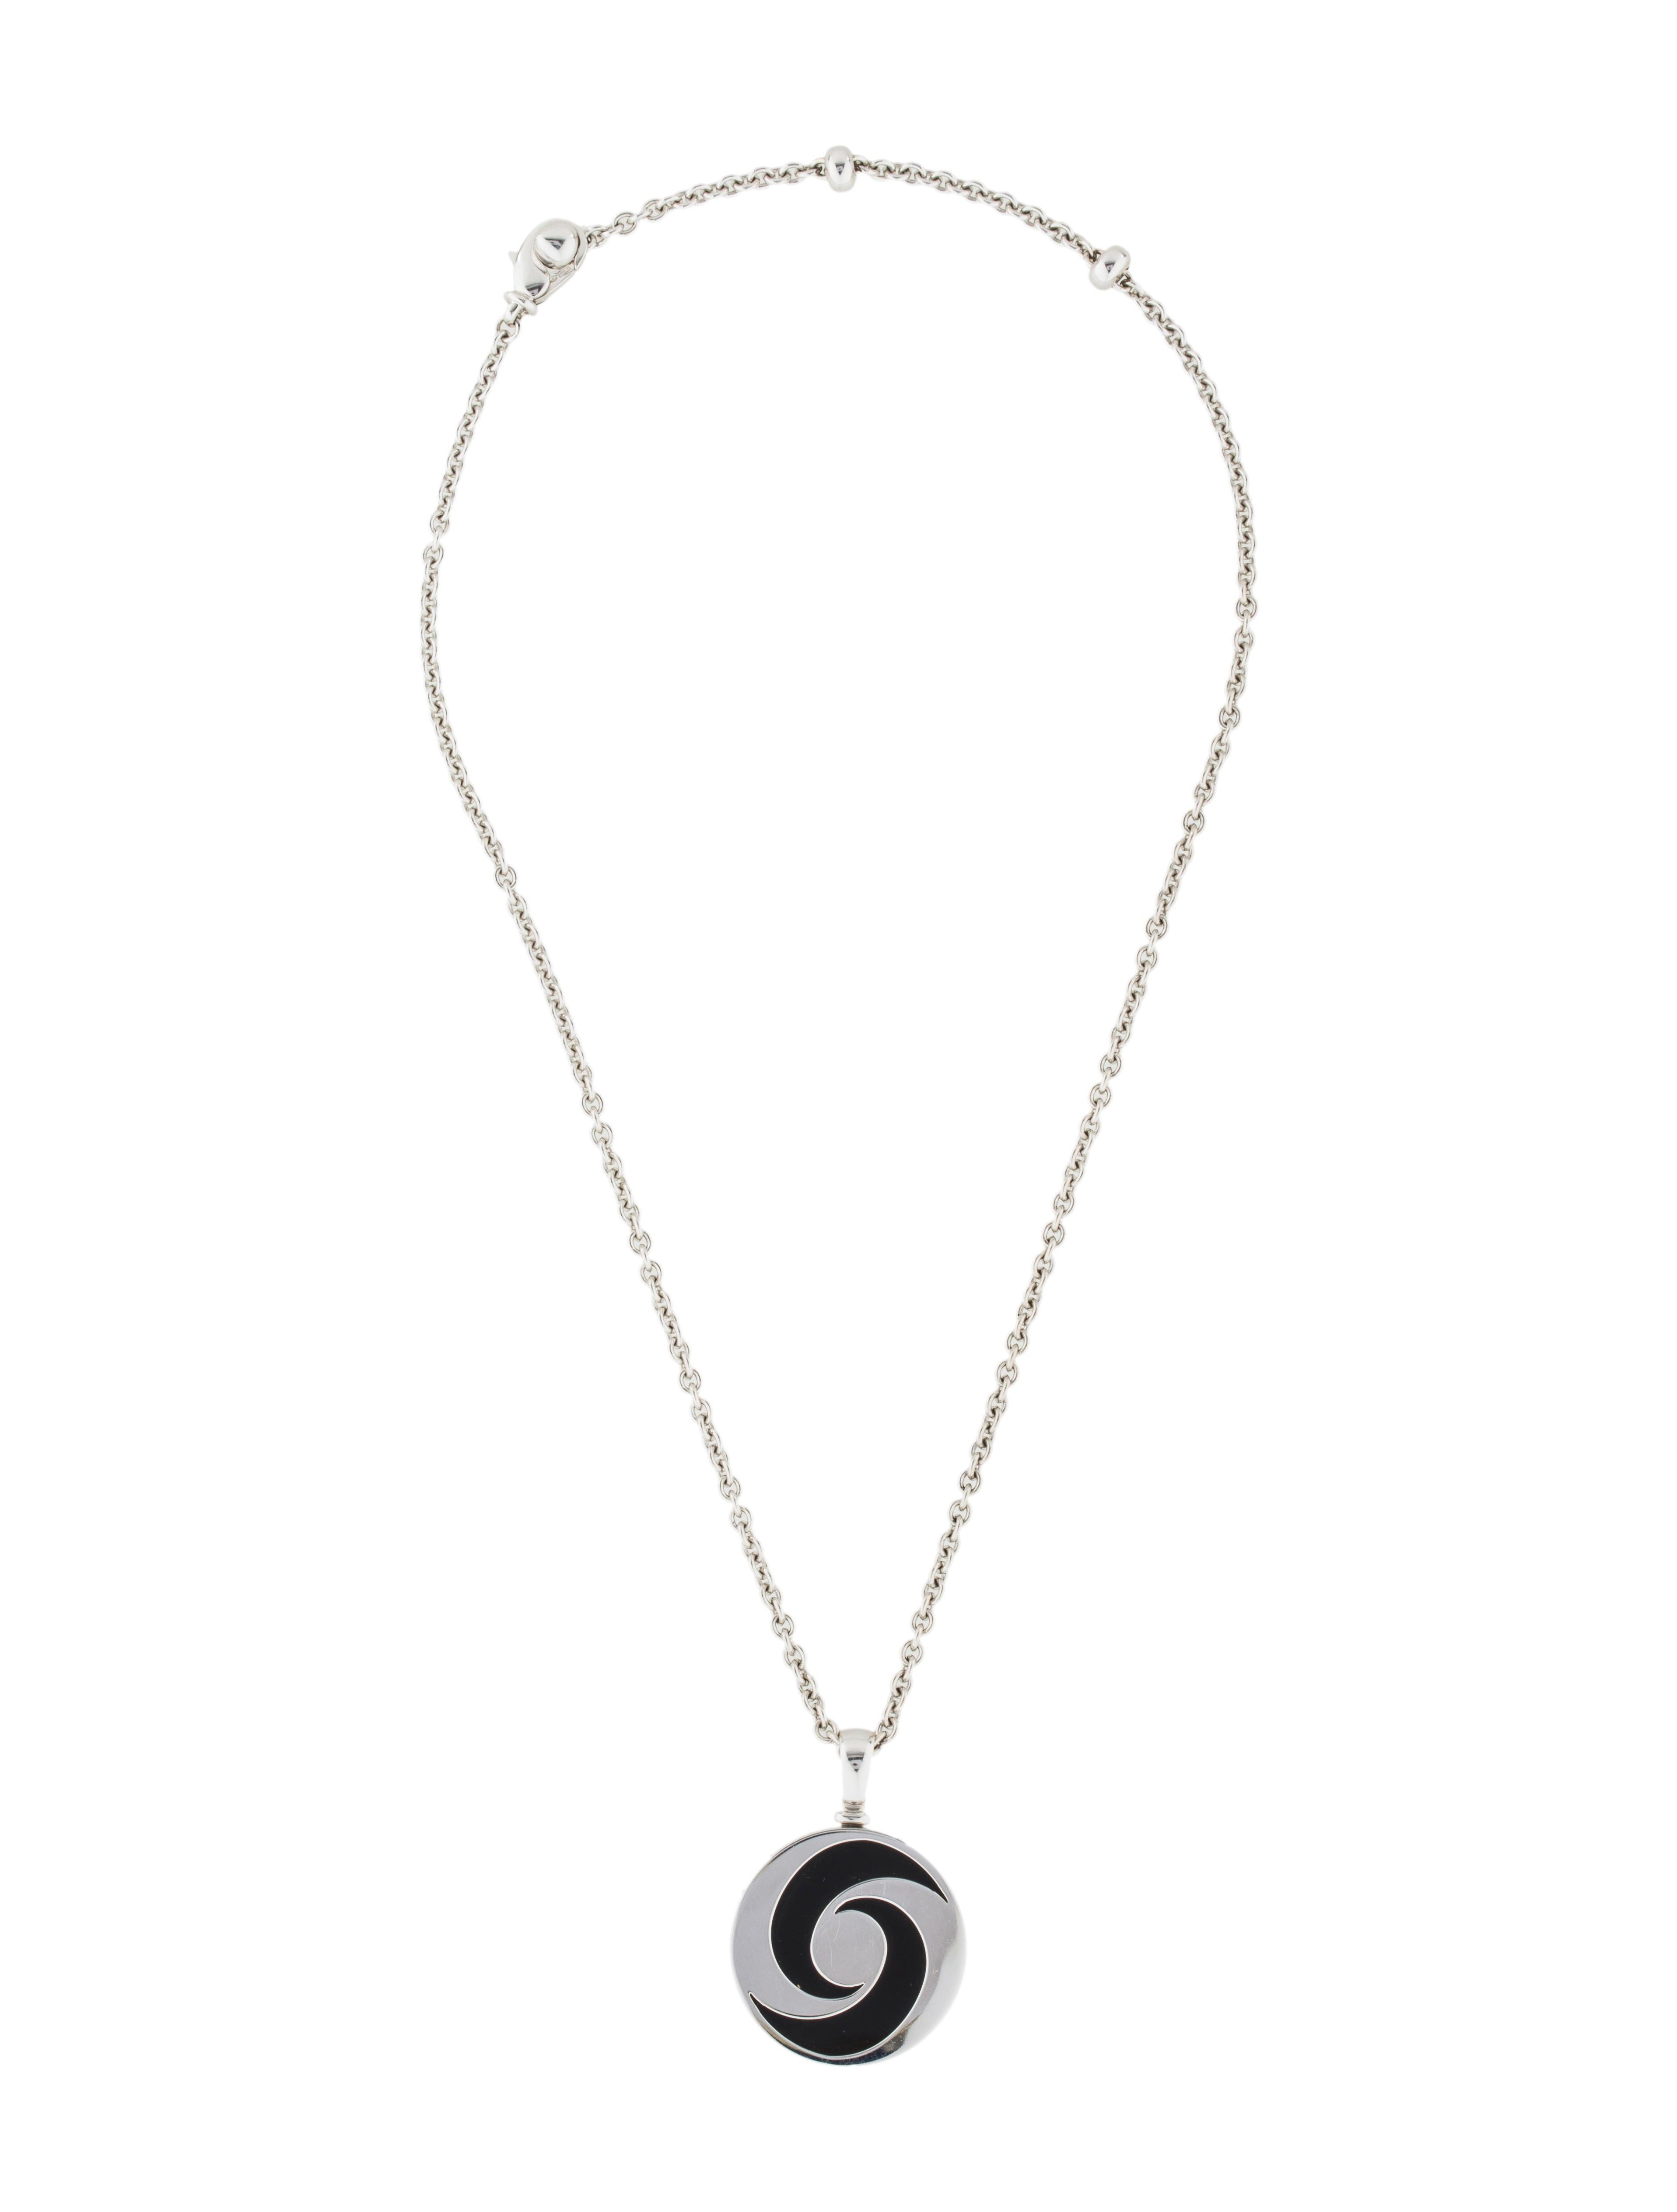 Bvlgari 18k onyx hypnotic pendant necklace necklaces bul26373 18k onyx hypnotic pendant necklace mozeypictures Choice Image